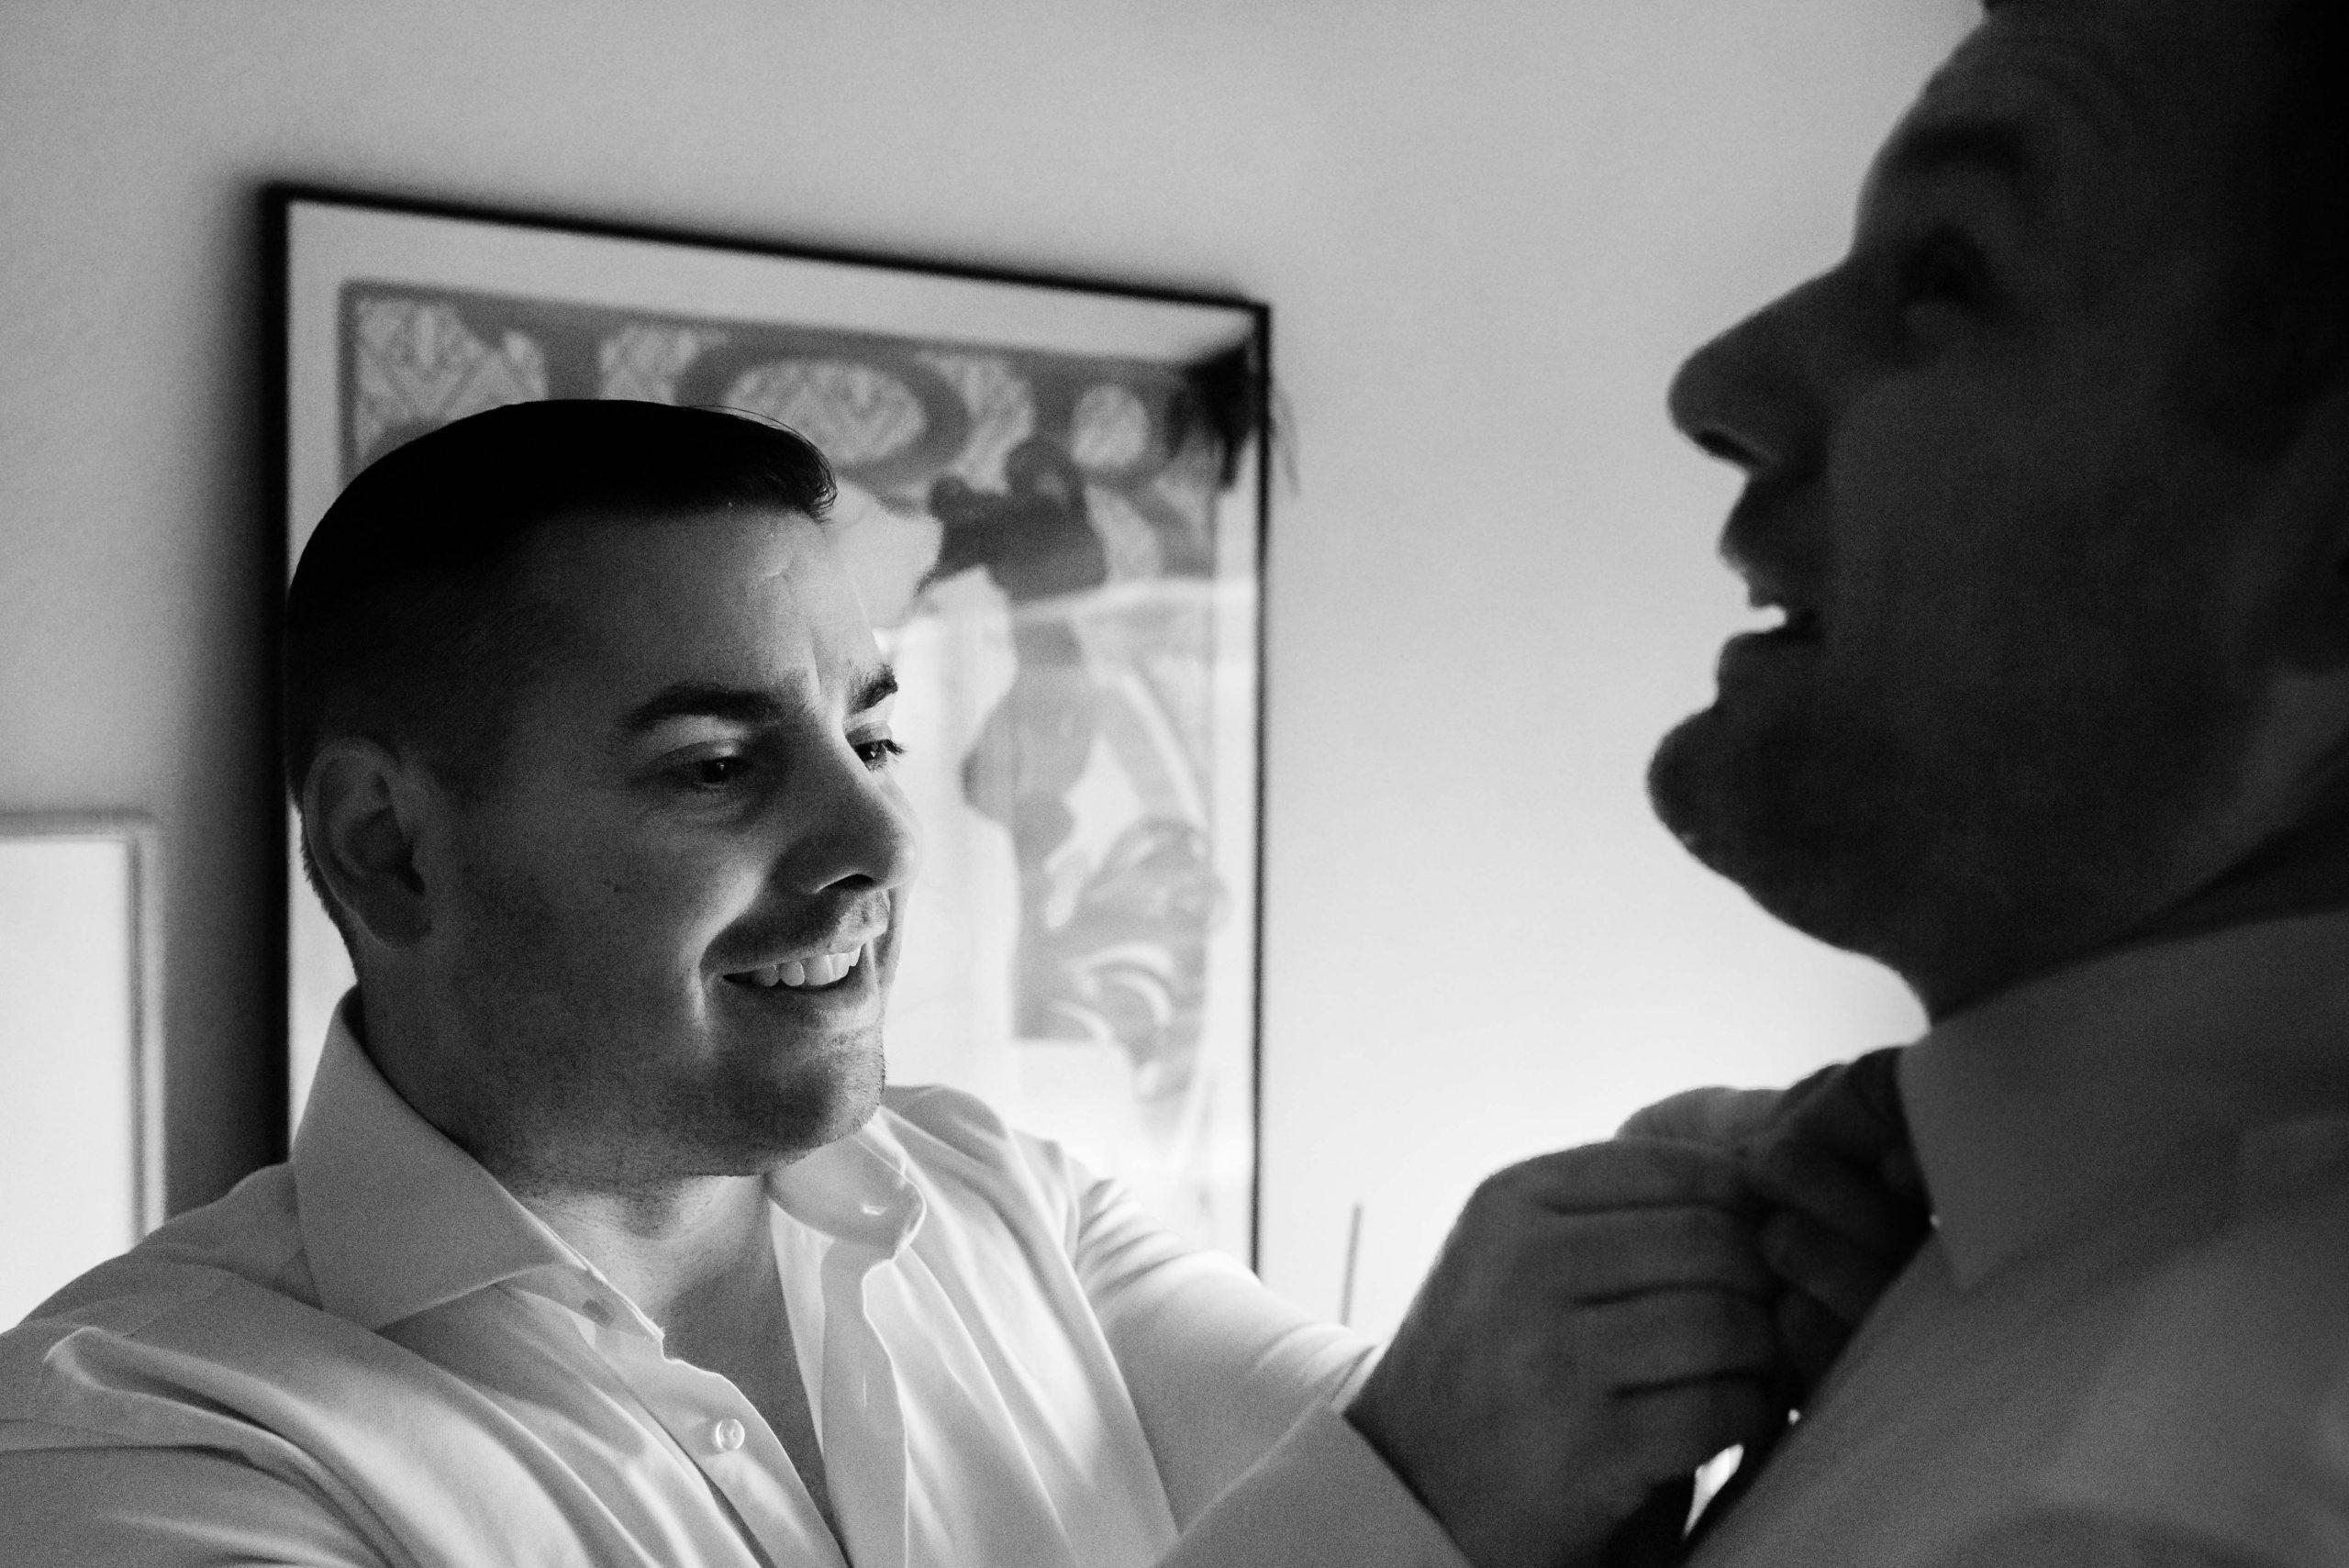 Best man helpt bruidegom met stropdas